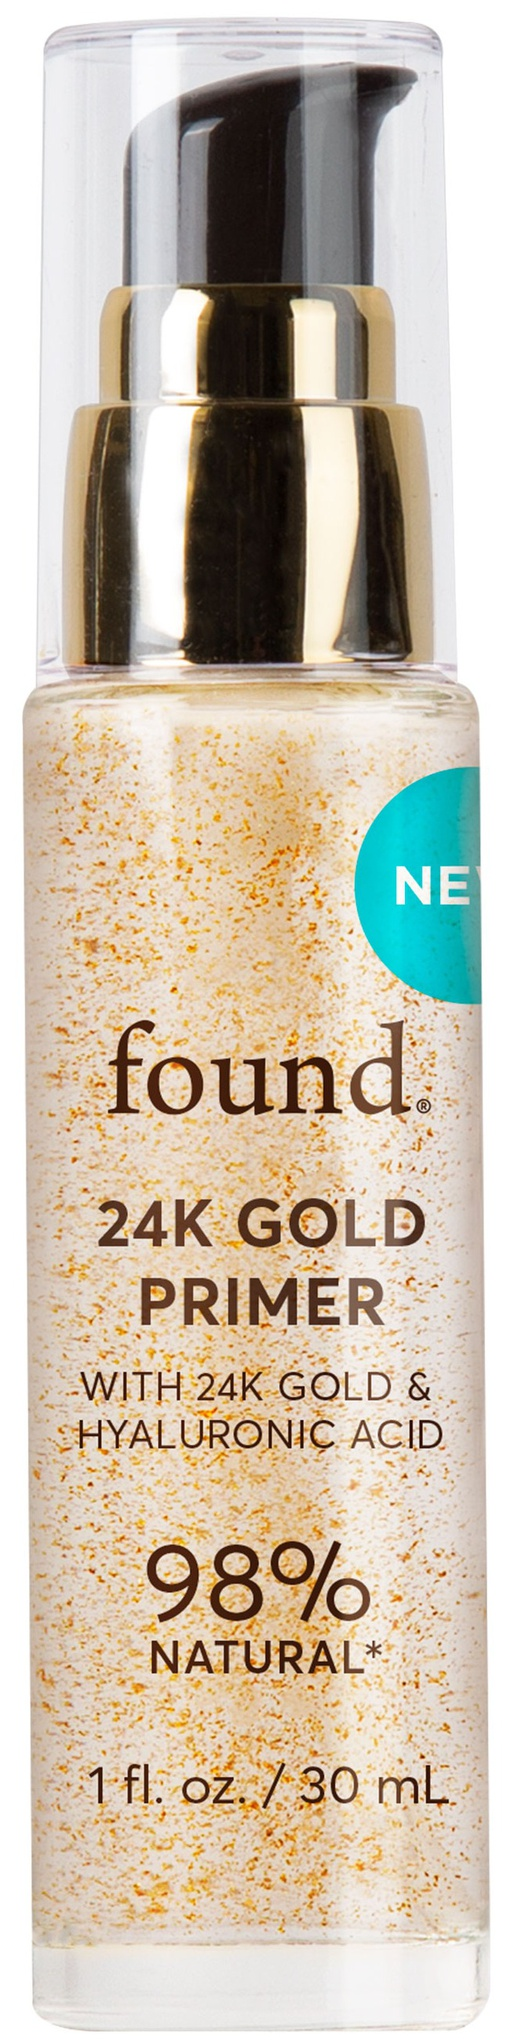 Found 24K Gold Primer